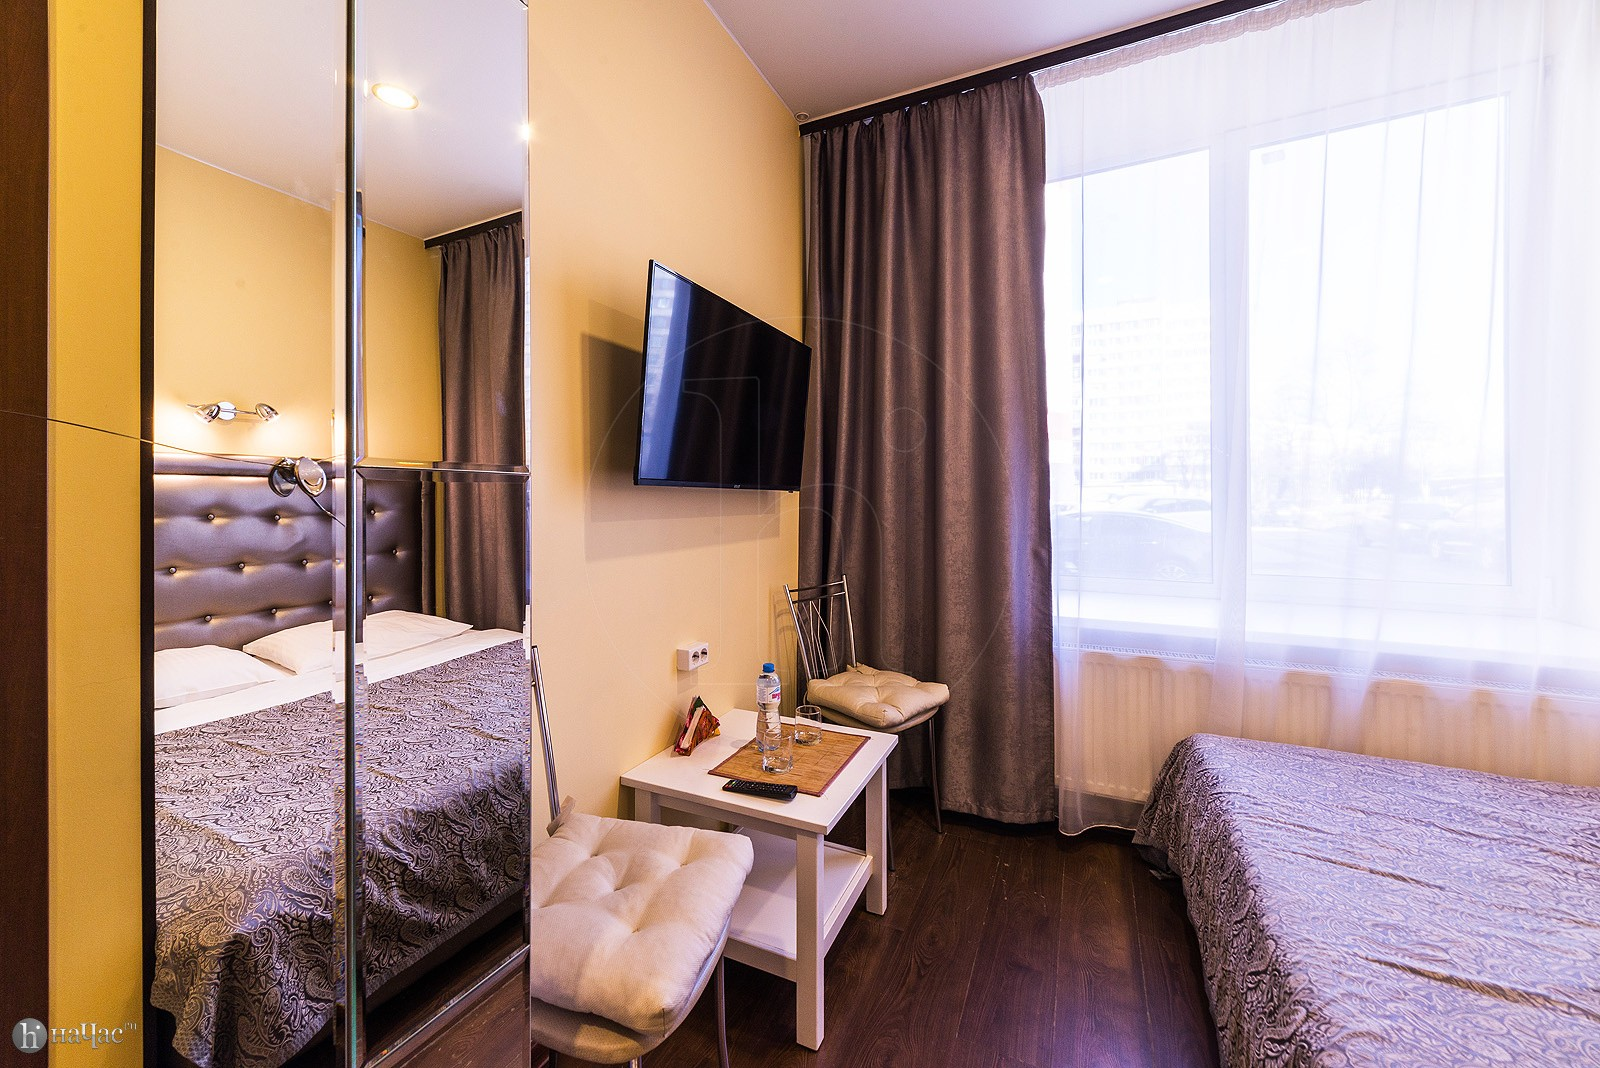 мини отель санкт-петербург цена